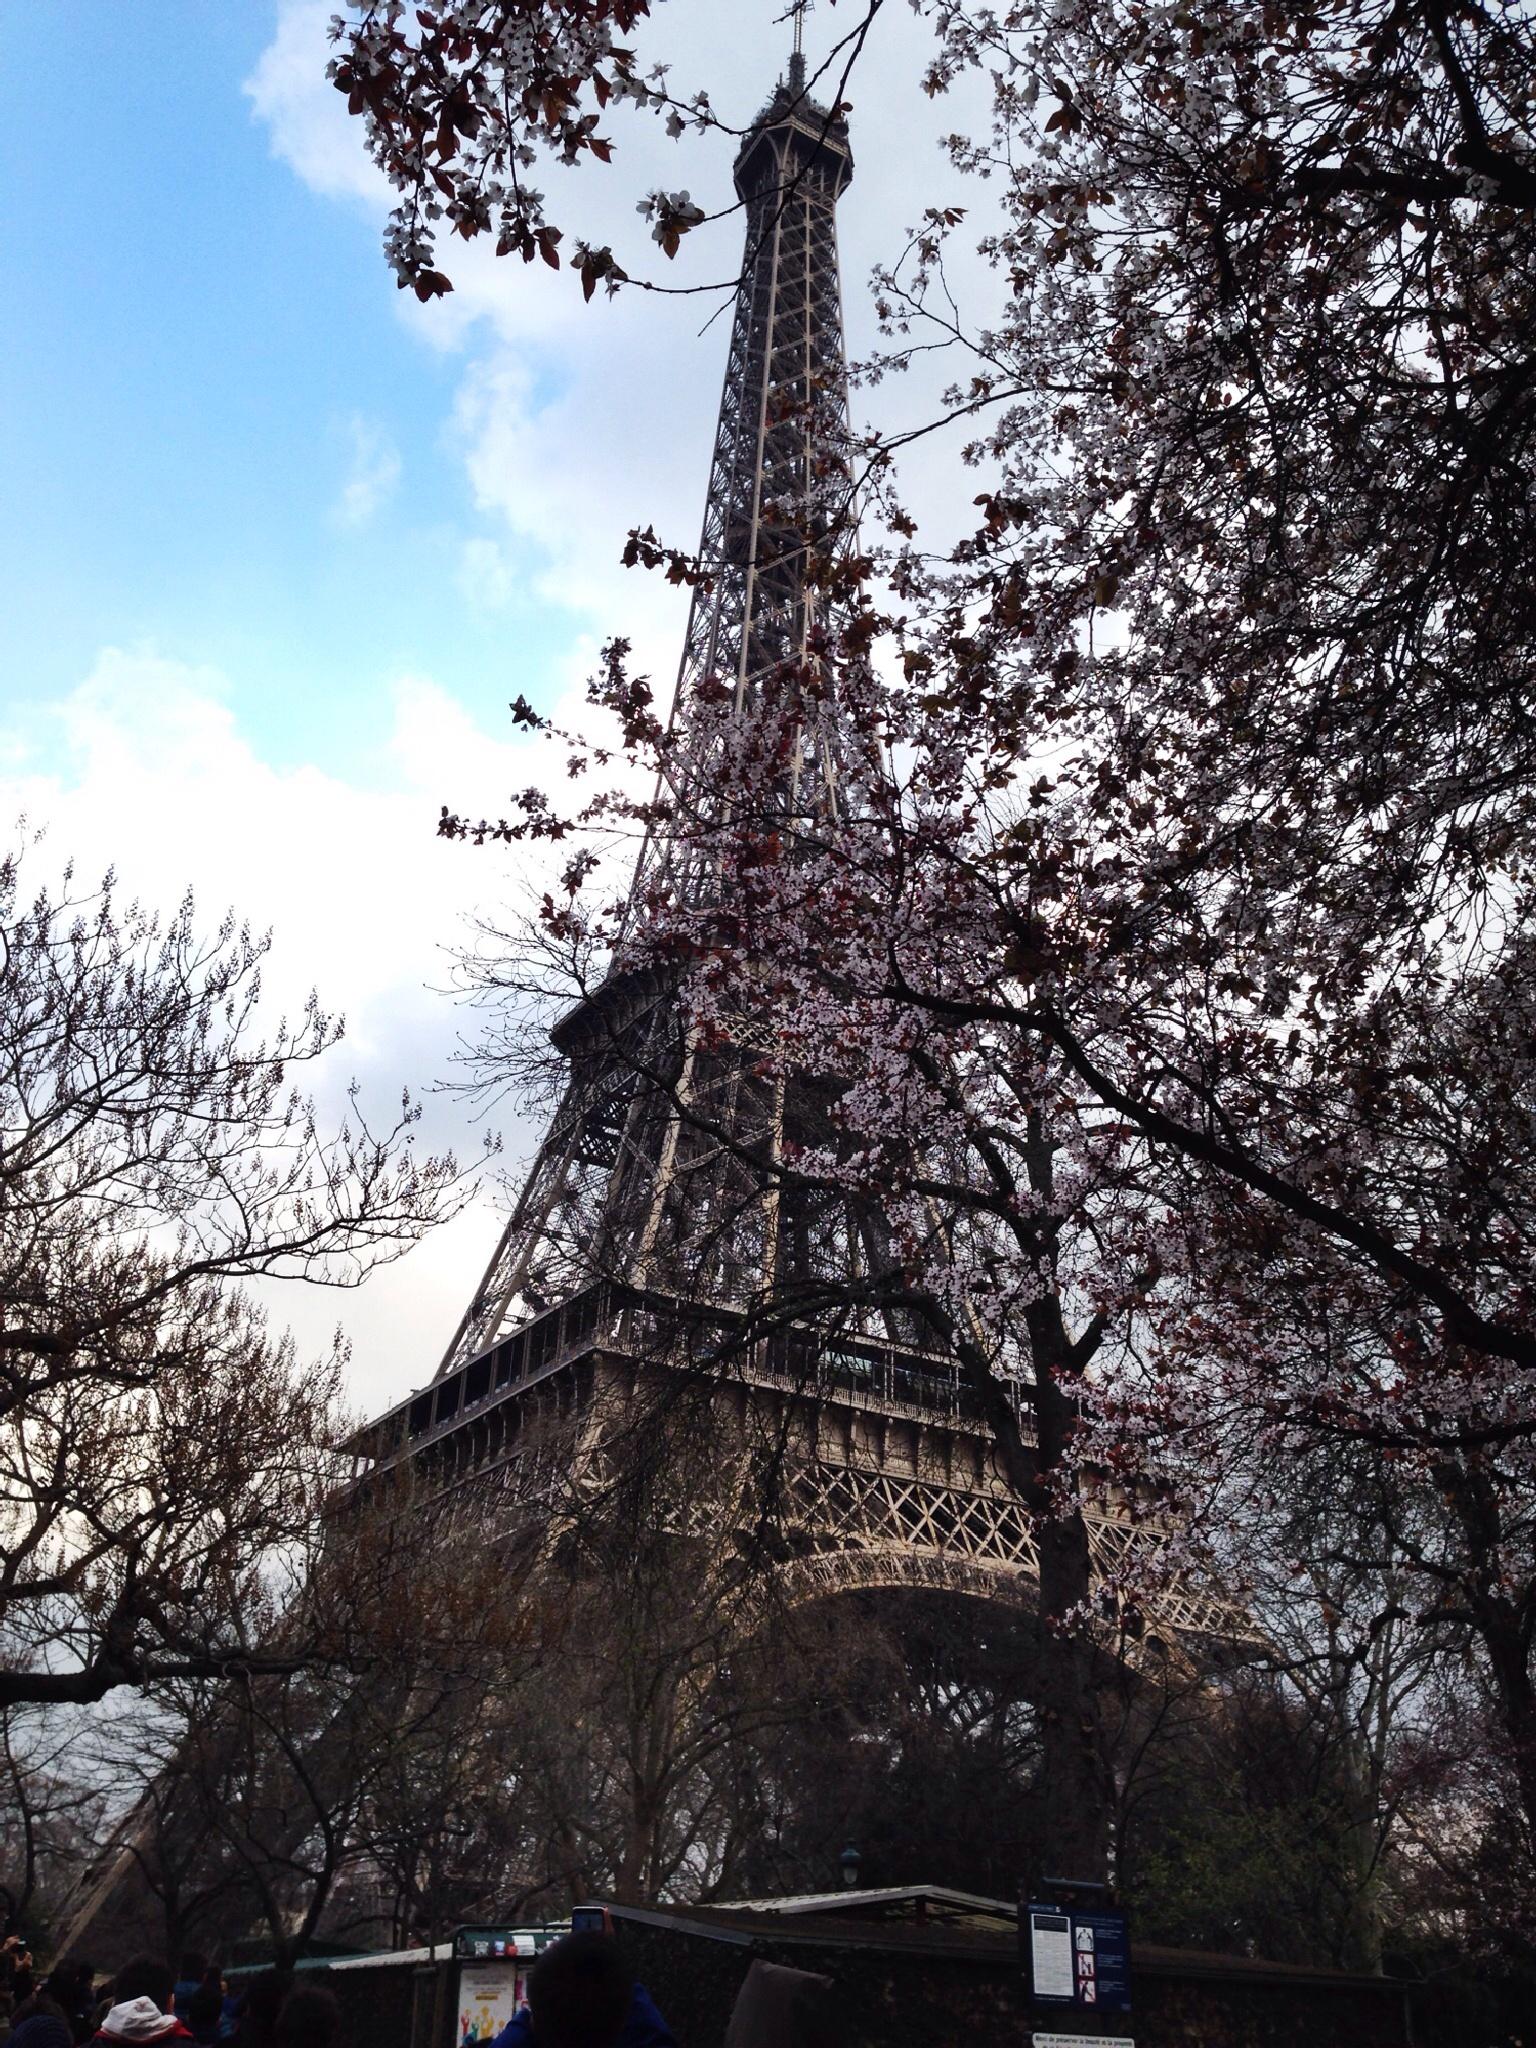 Tour Eiffel, Paris by gabrielebianchini